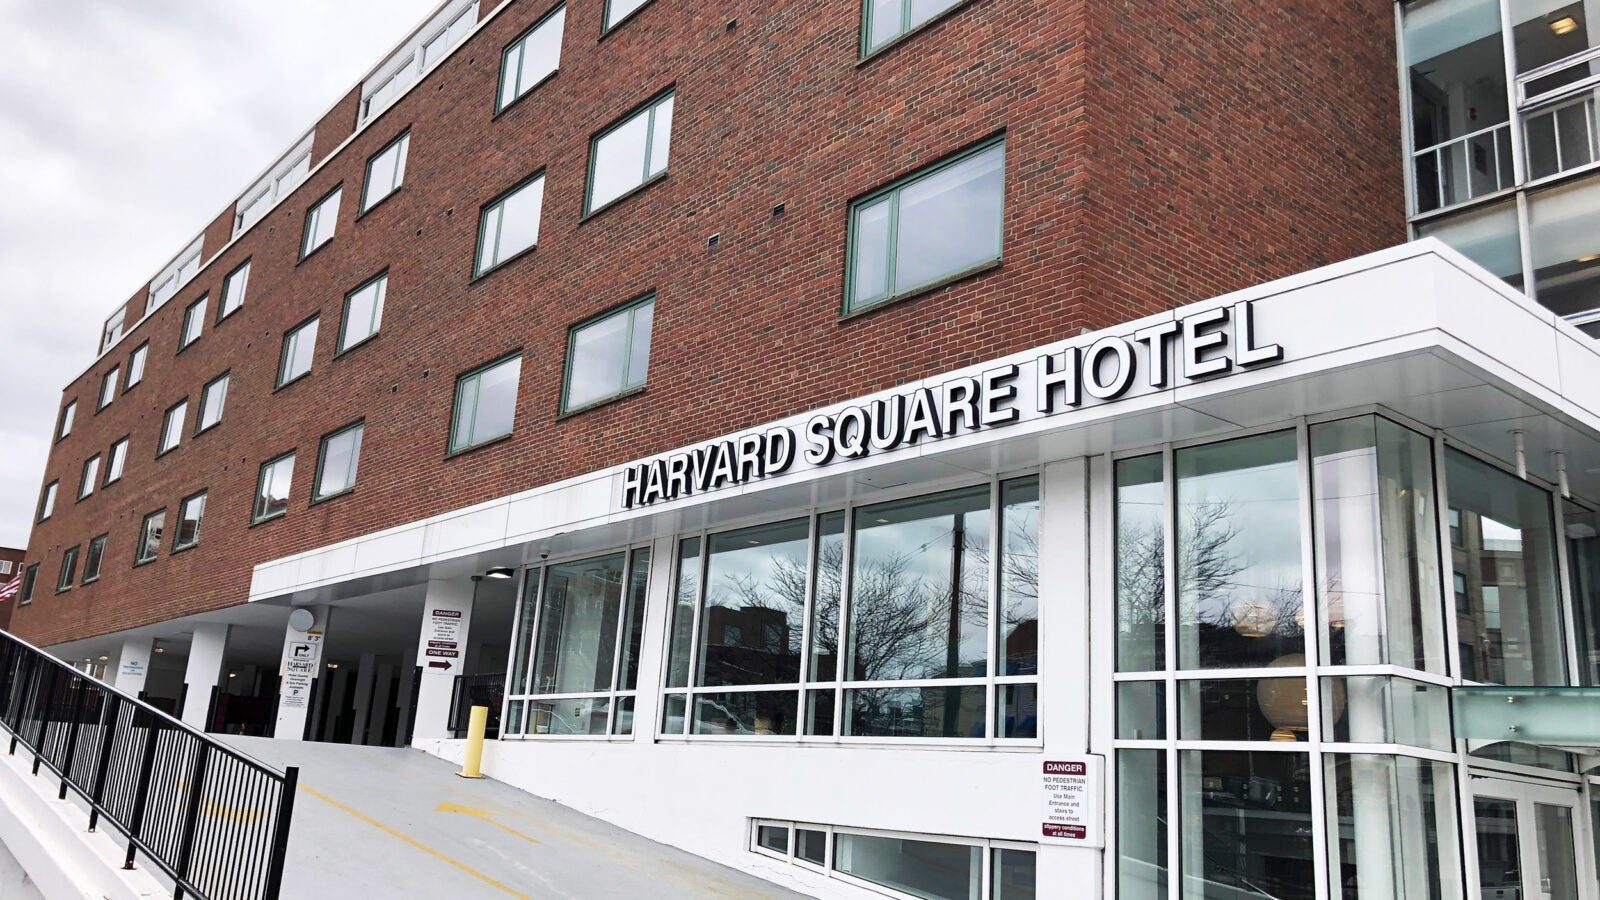 Harvard Square Hotel.